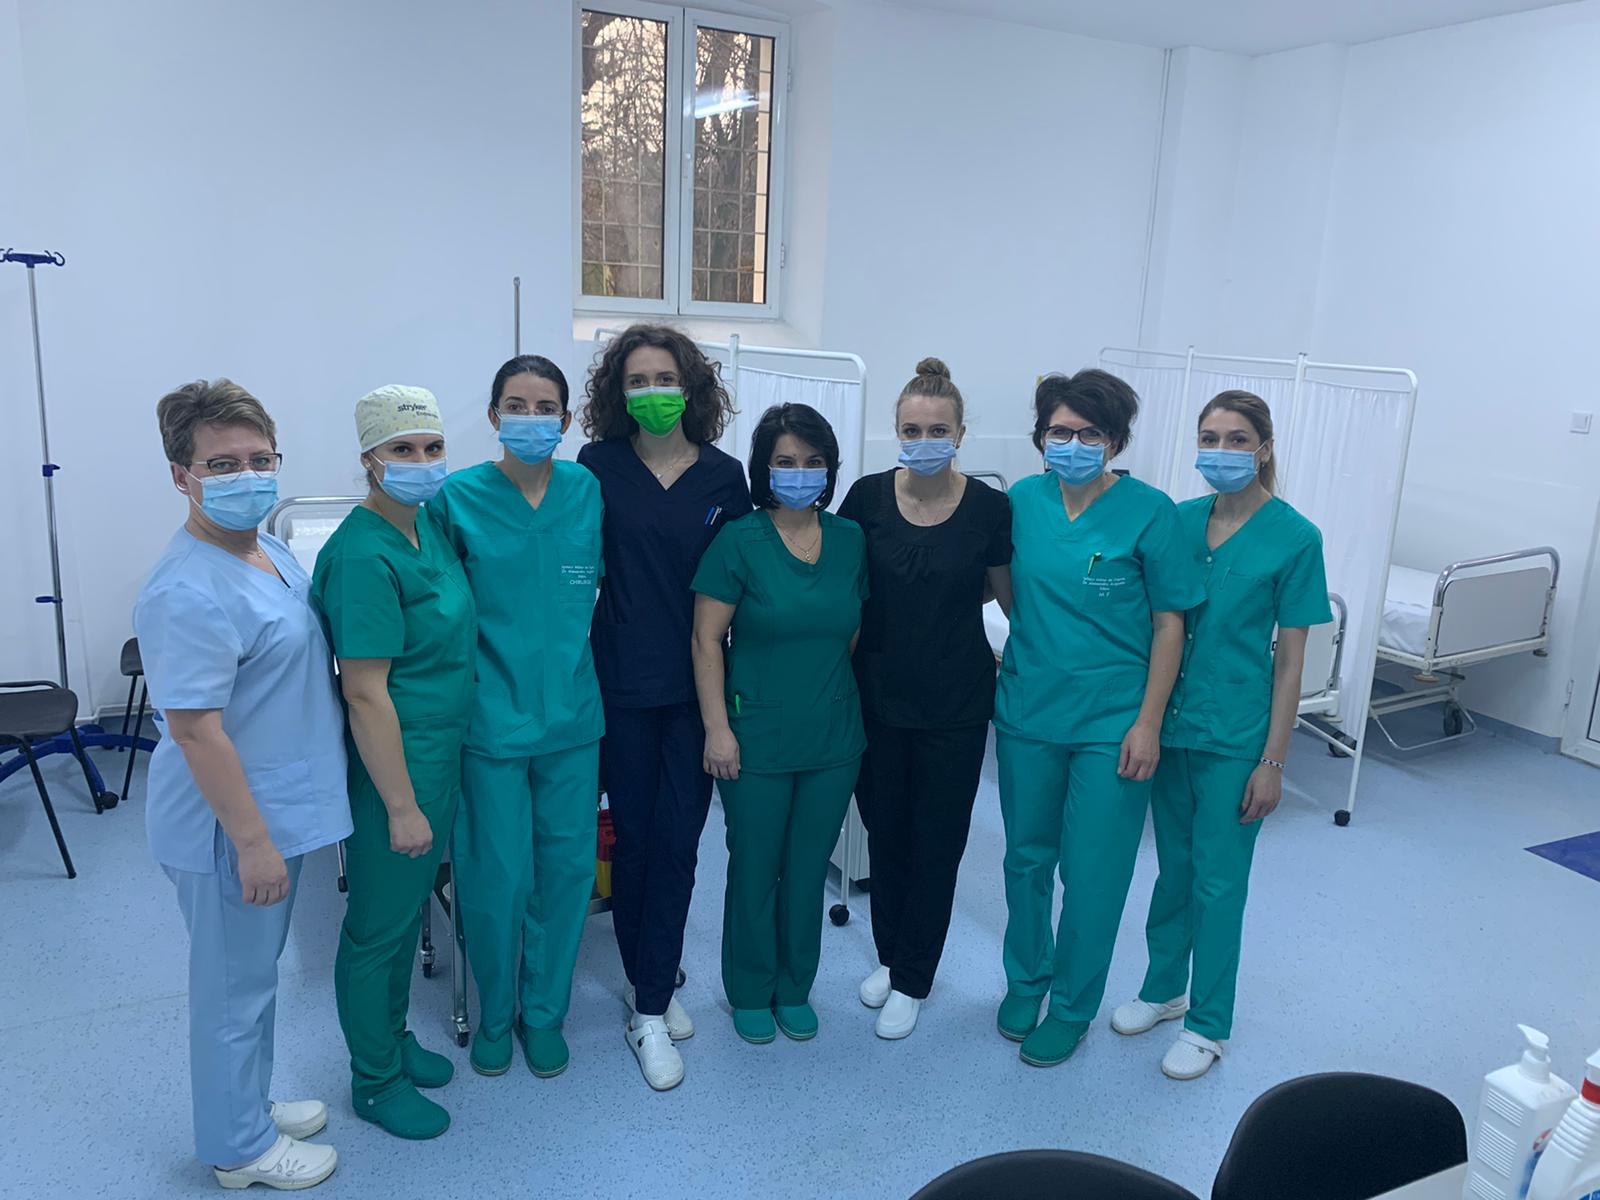 FOTO- Spitalul Militar Sibiu a început campania de vaccinare anti-COVID